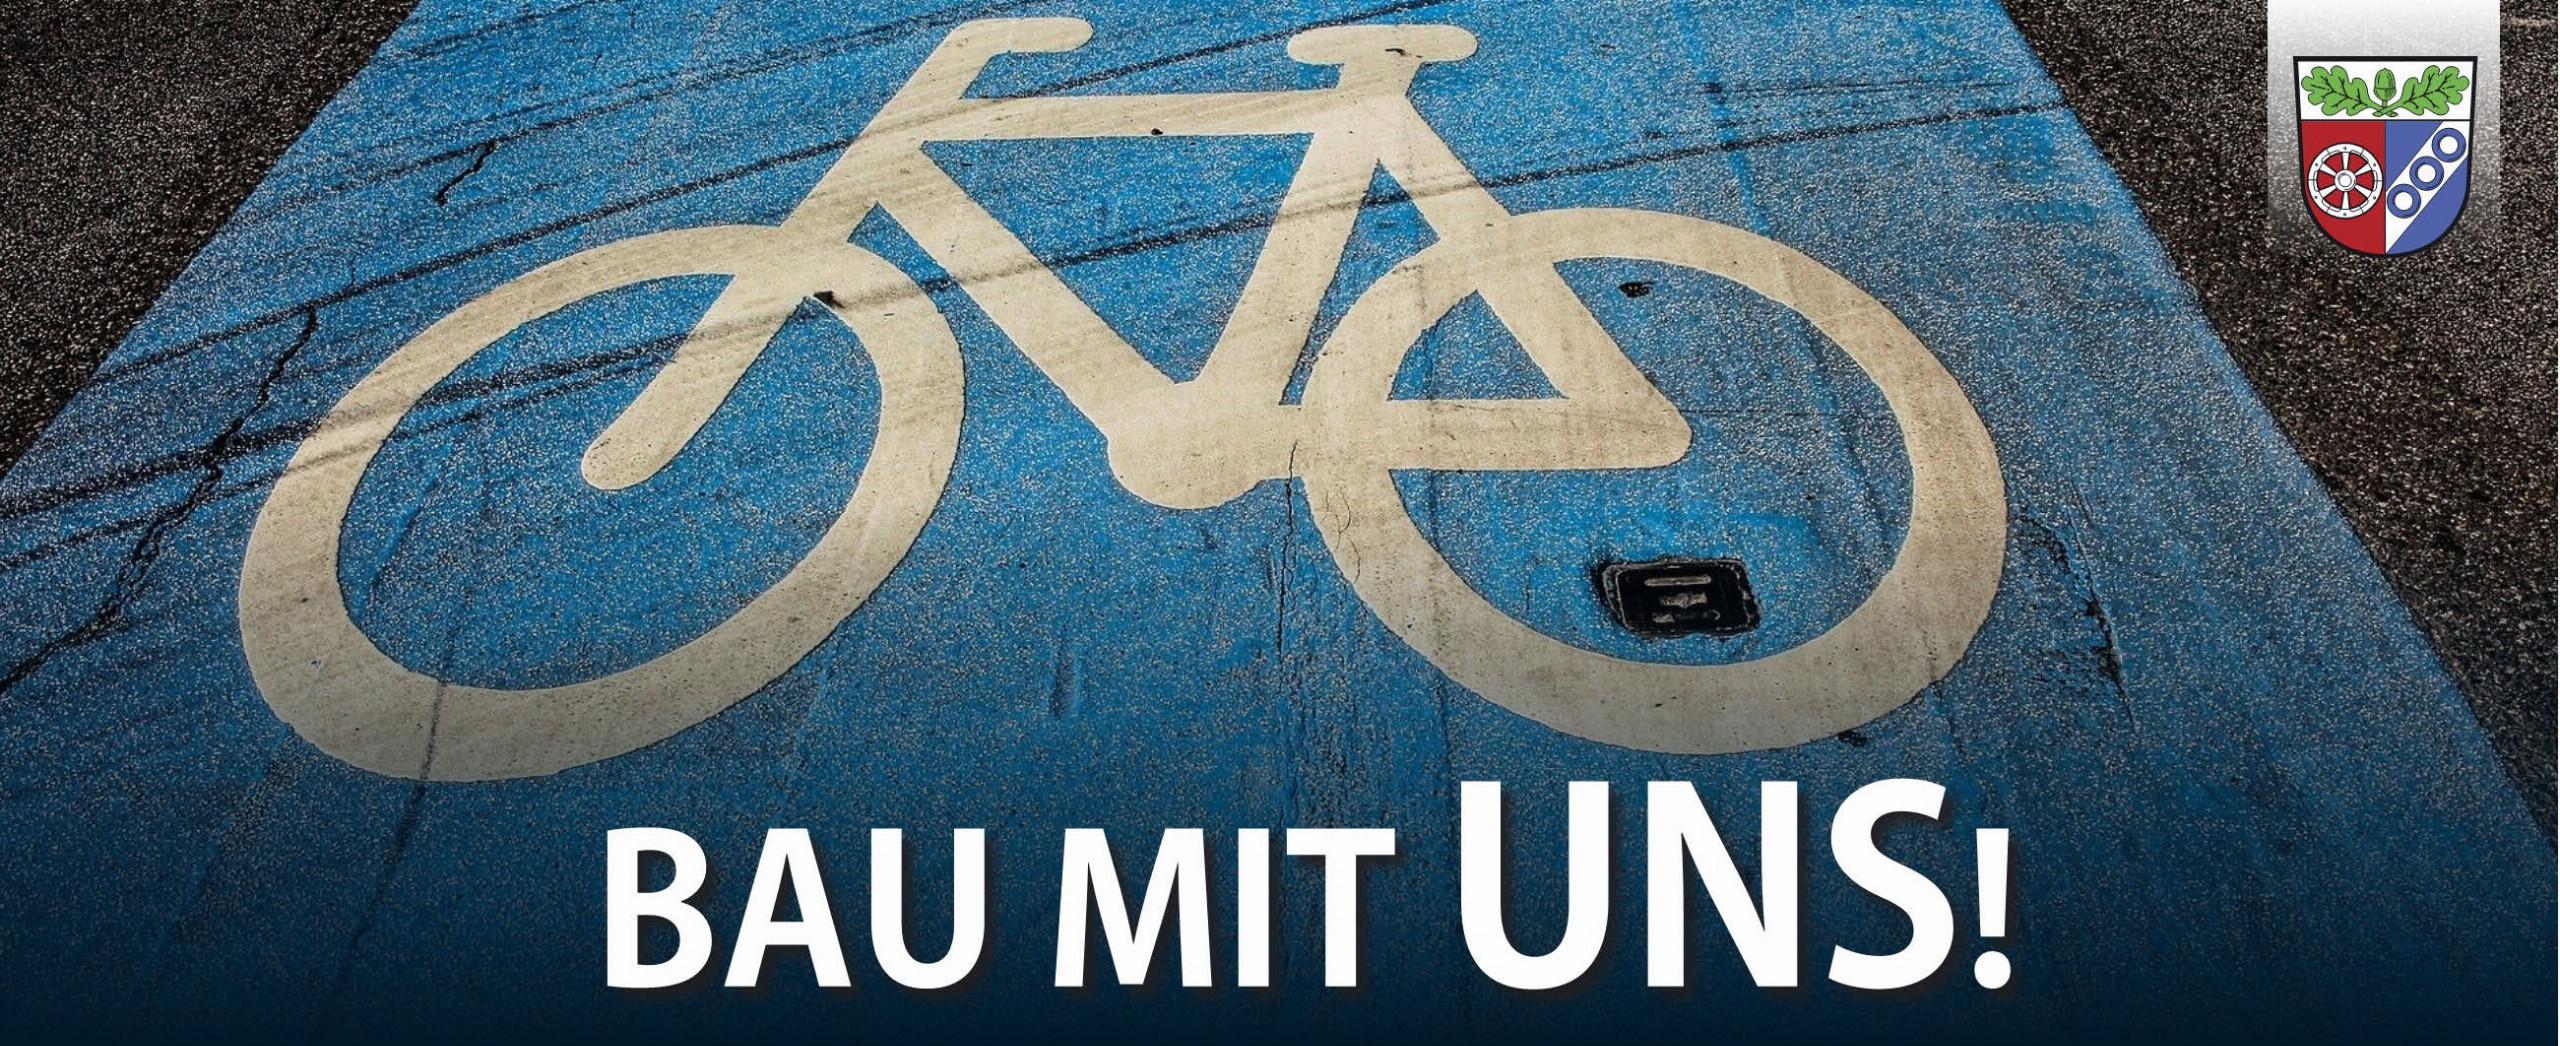 Check-In_Radwegebeauftragter2.jpg